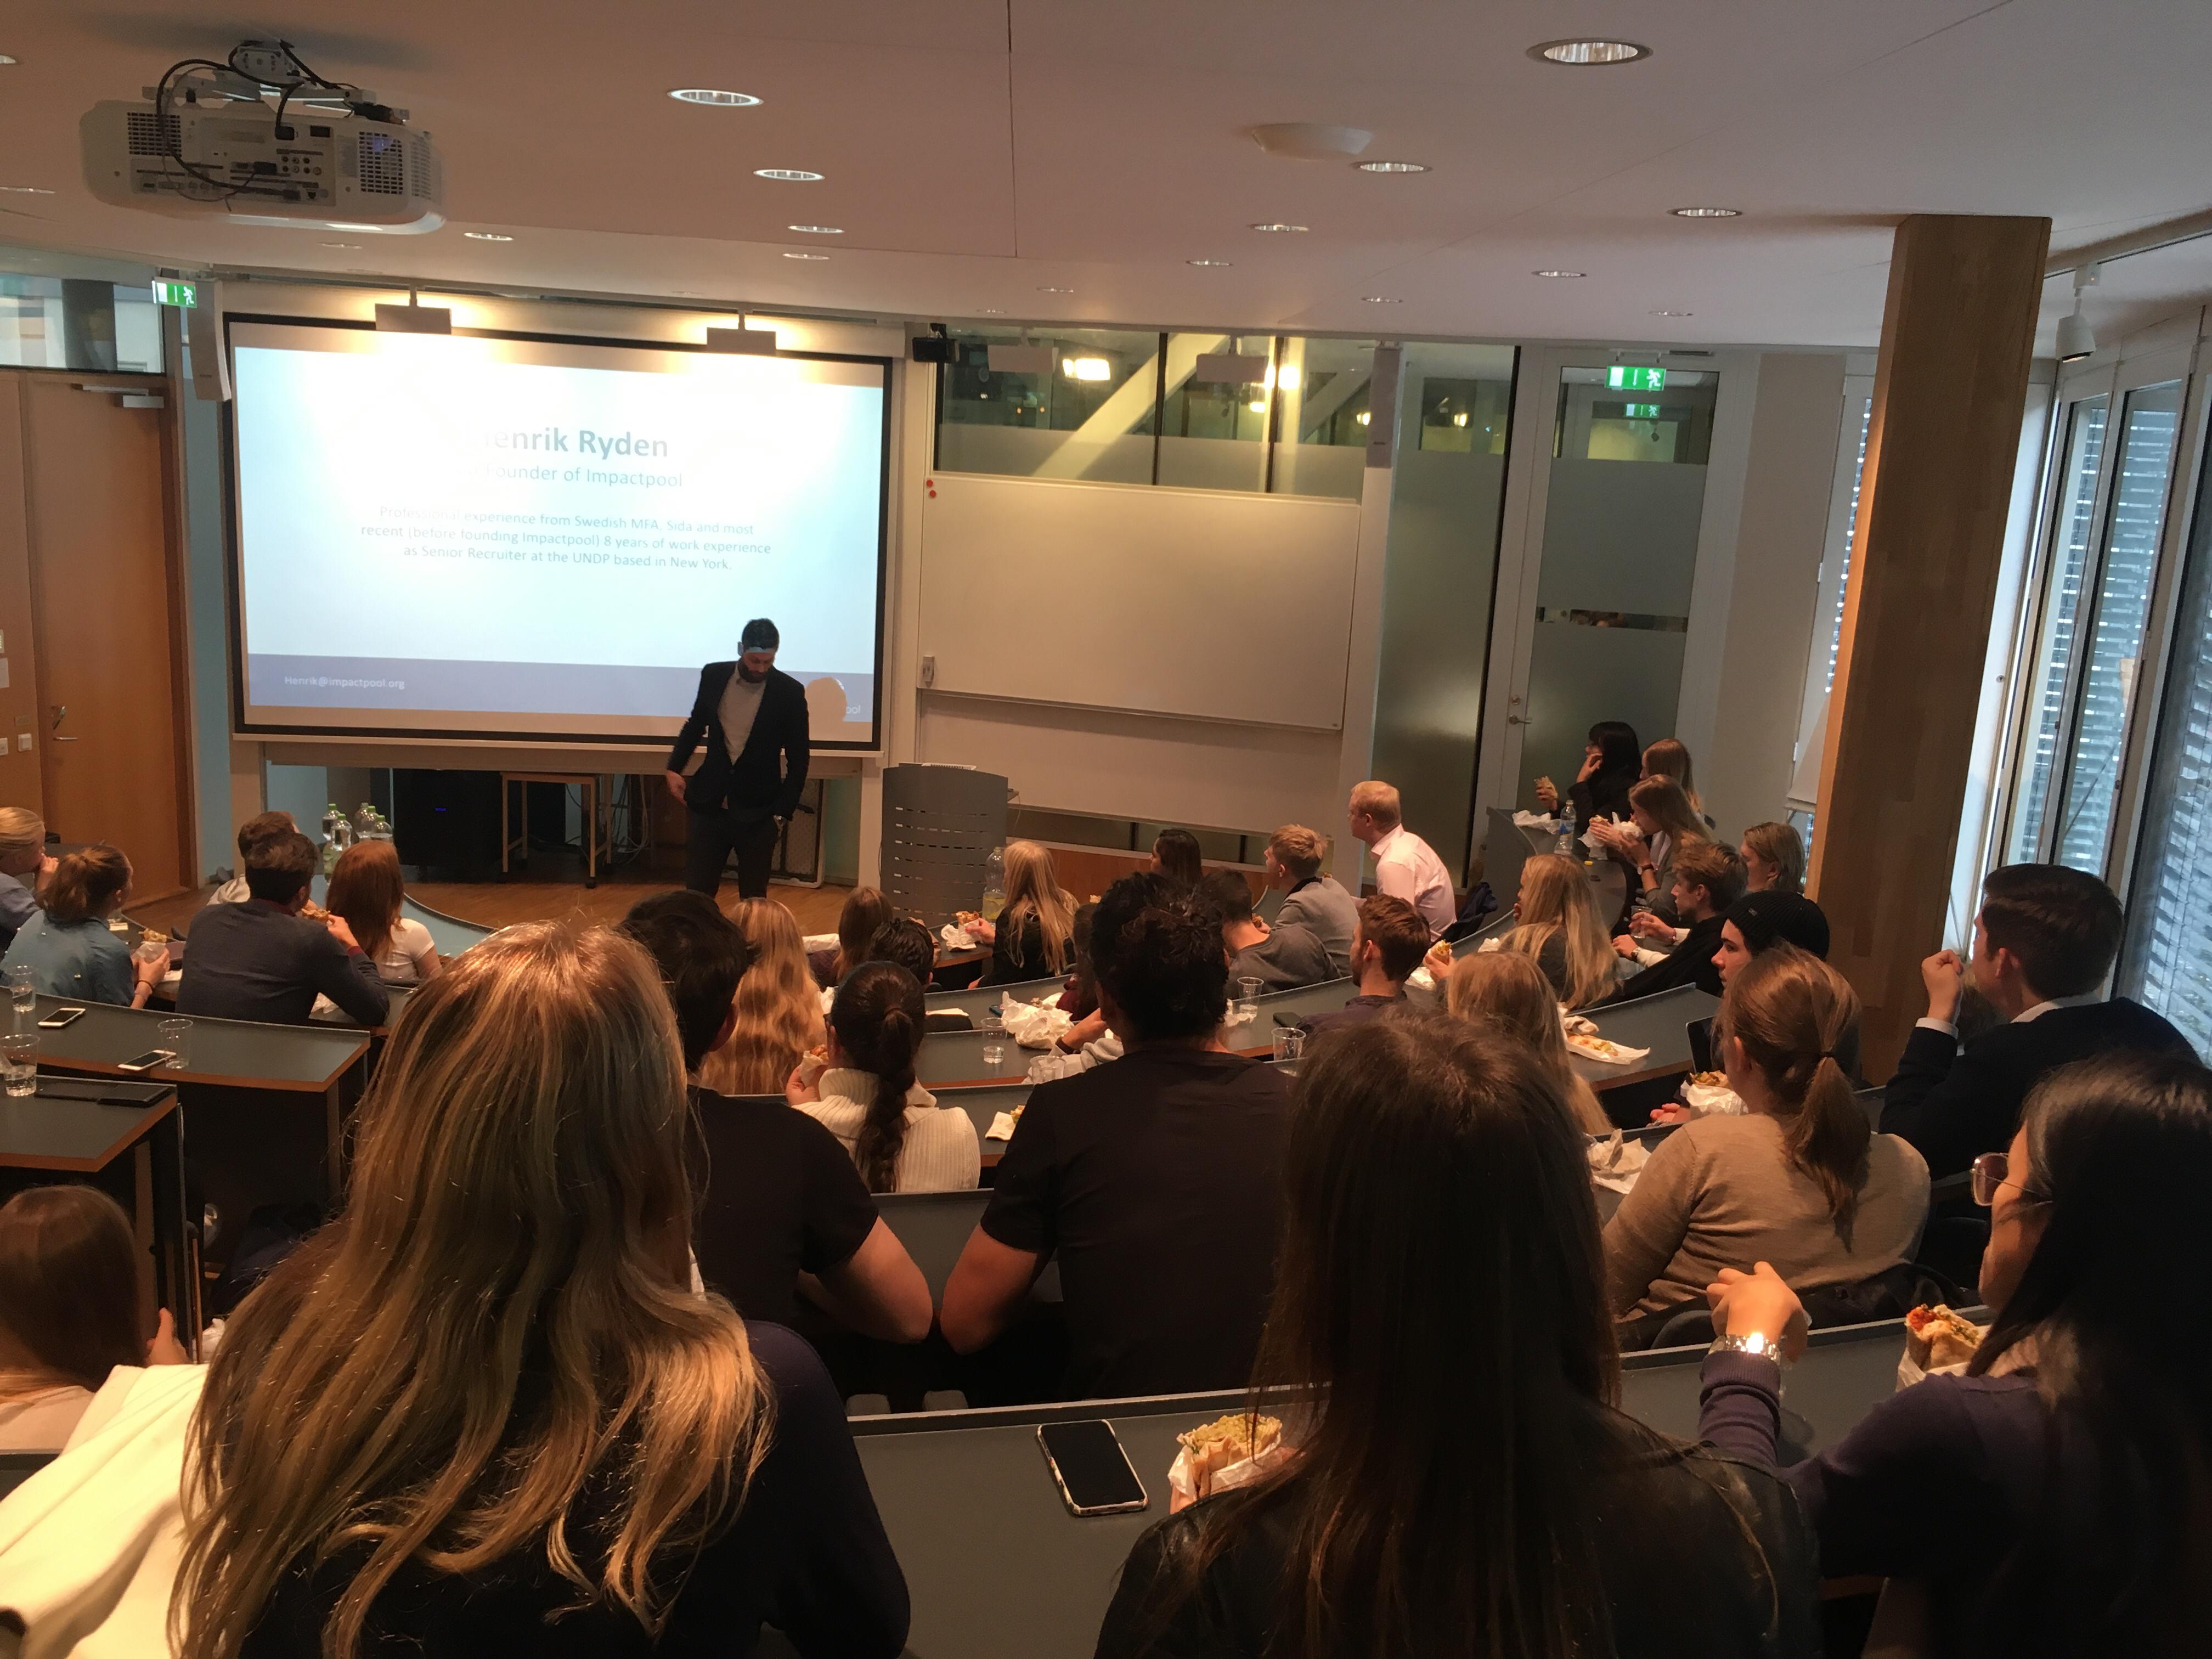 Impactpool speaks at the stockholm school of economics 8bdda253 e6f2 412c 9ed0 844e4a02dc9d